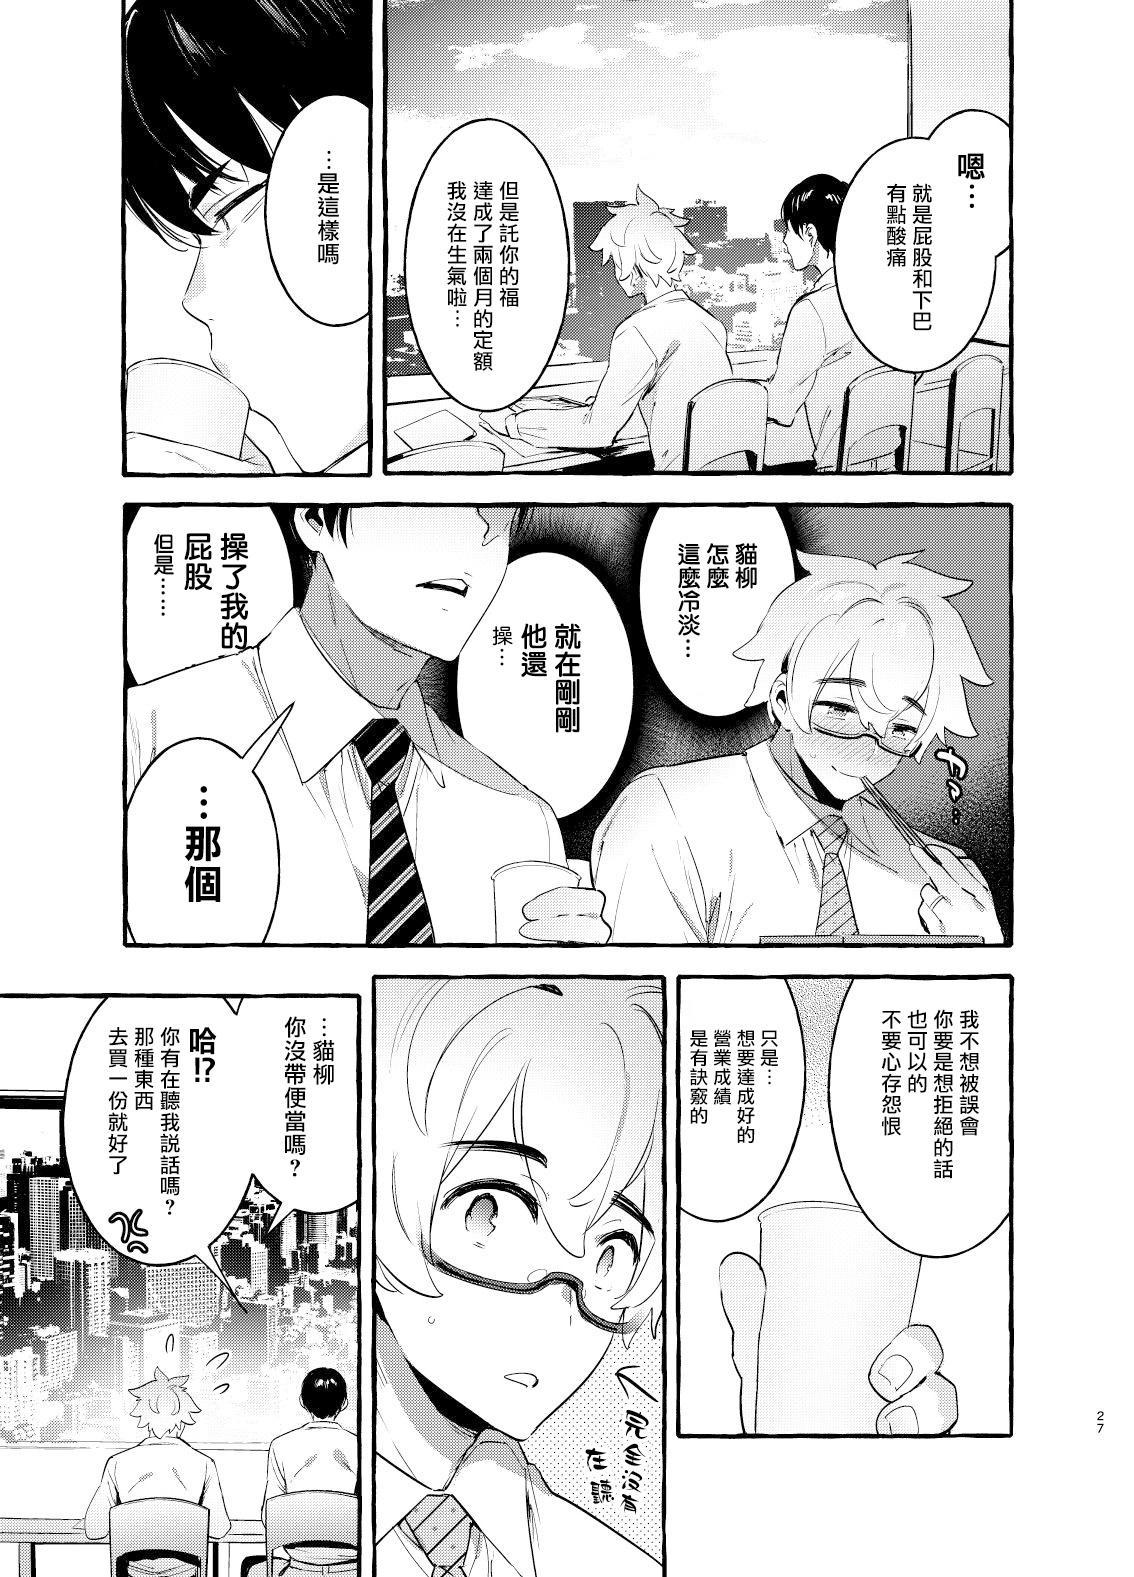 [Otosan no Kurorekishi (Maemukina Do M)]  Wanwan Otou-san   犬系爸爸 01-02 [Chinese] [拾荒者汉化组] [Digital] 27